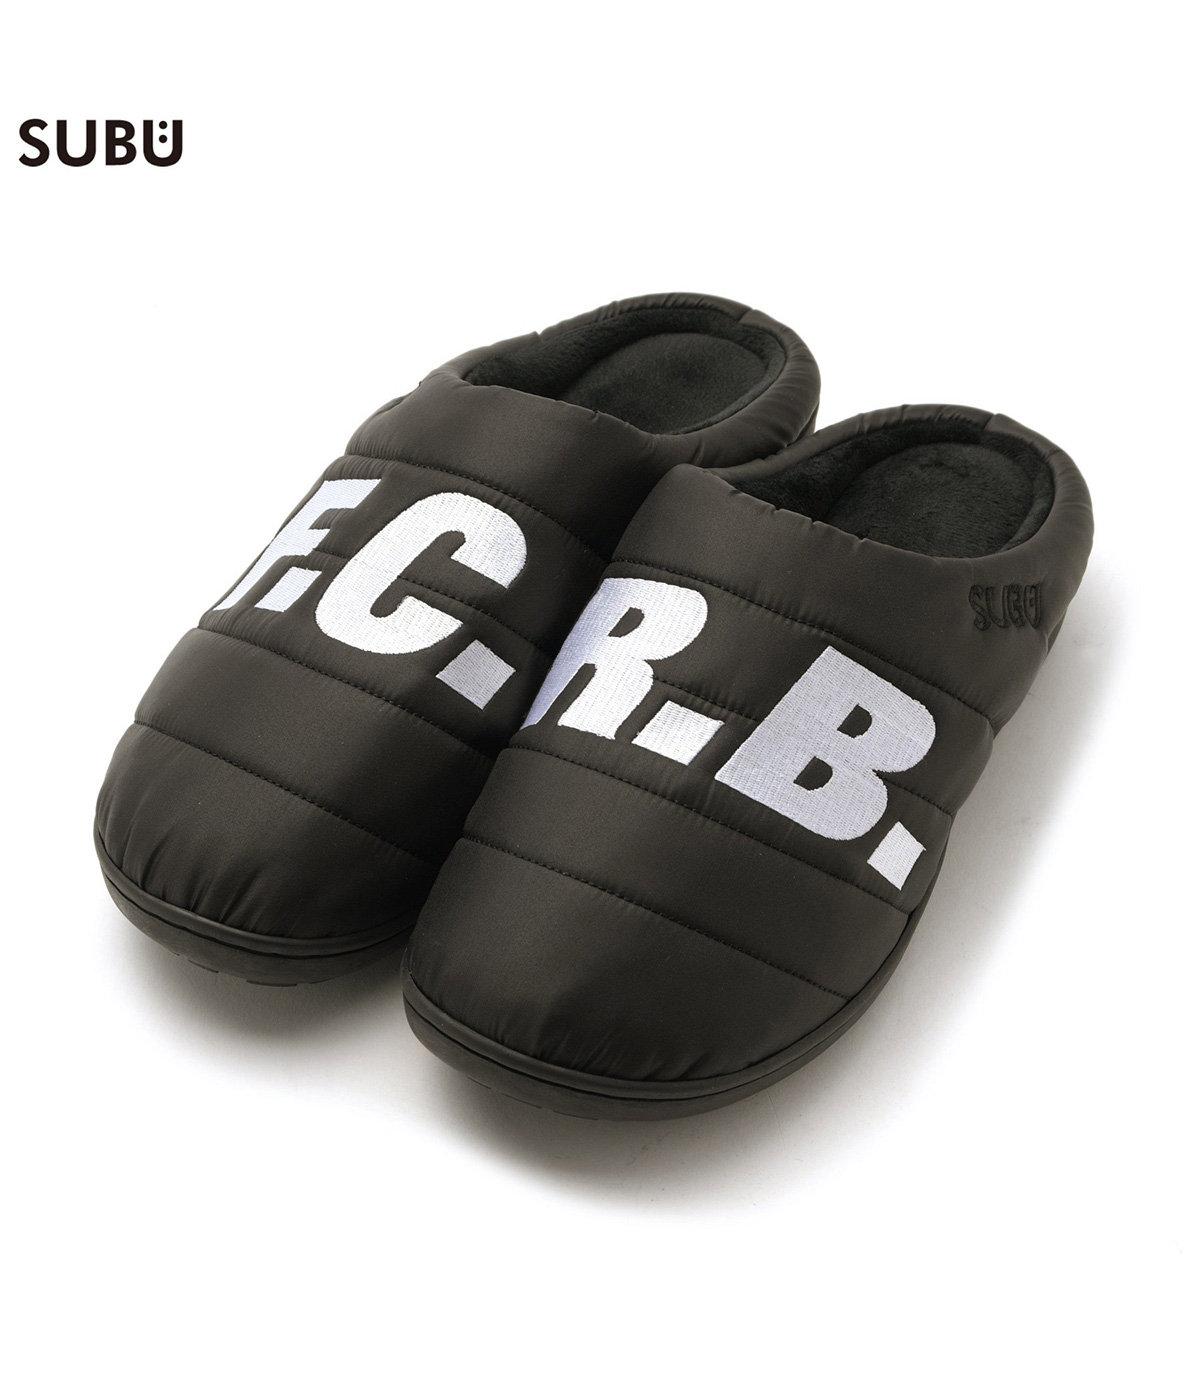 SUBU F.C.R.B. SANDAL